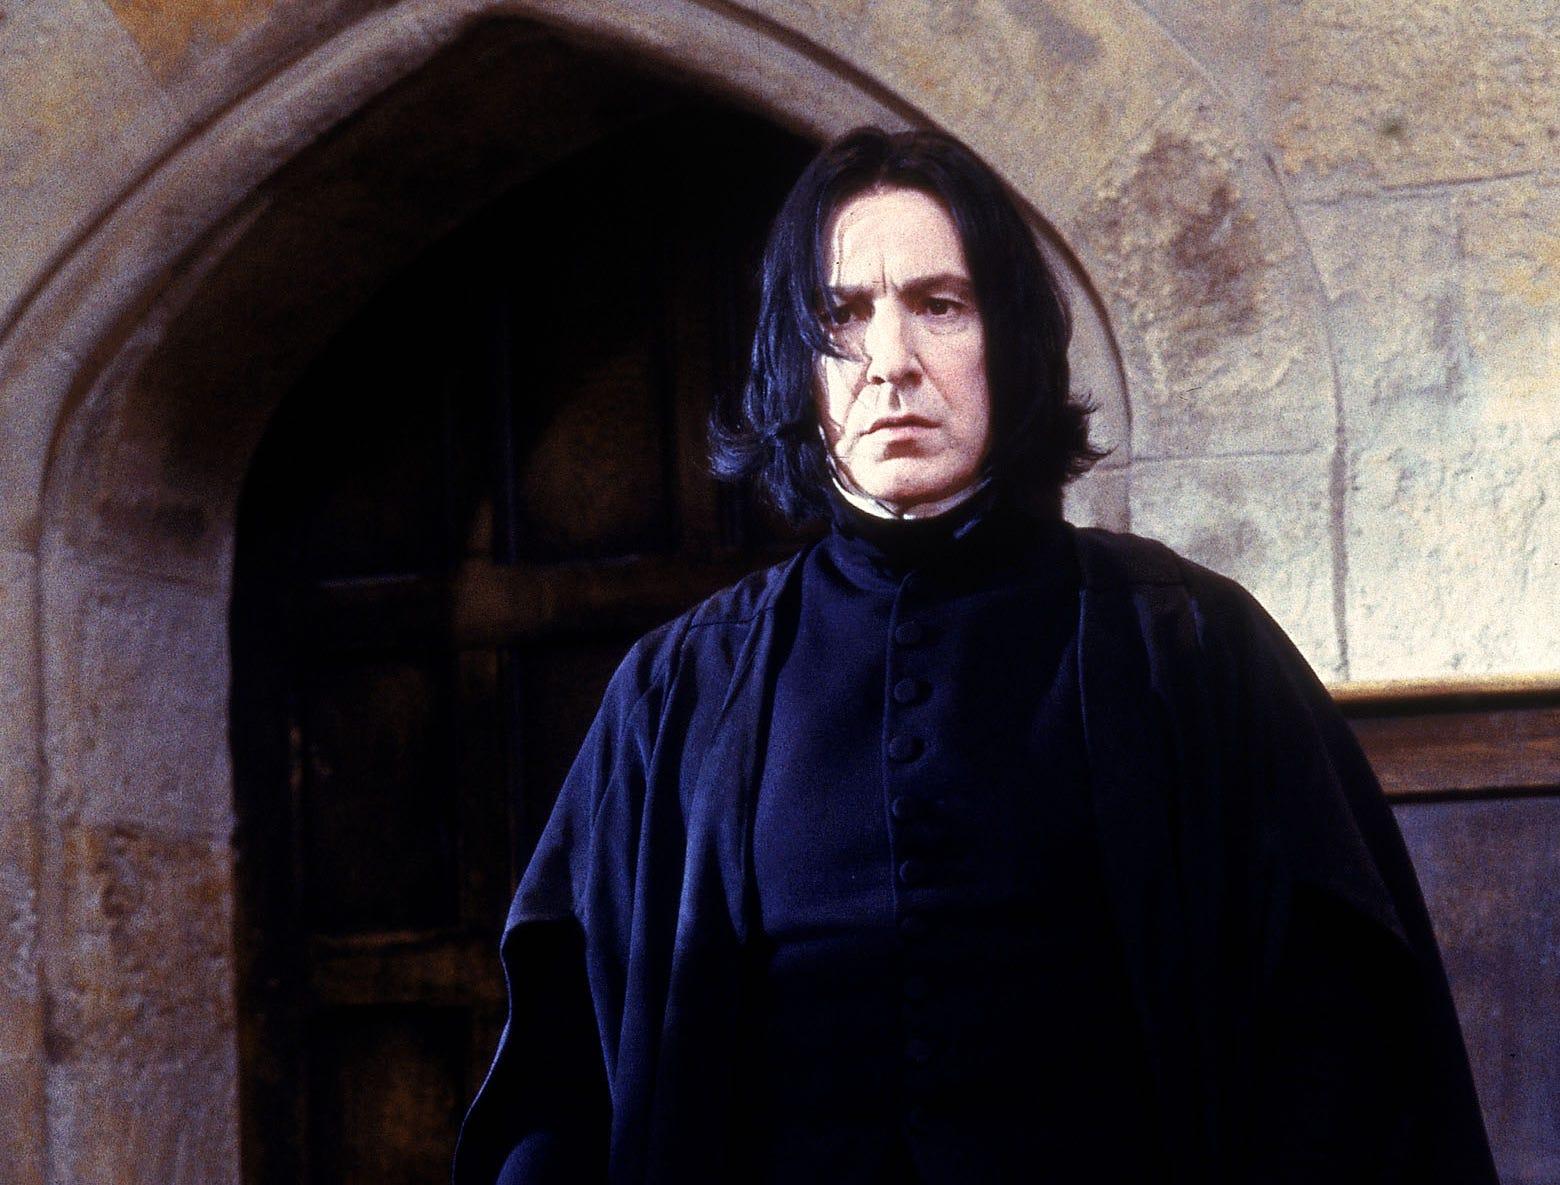 Alan Rickman as Professor Snape